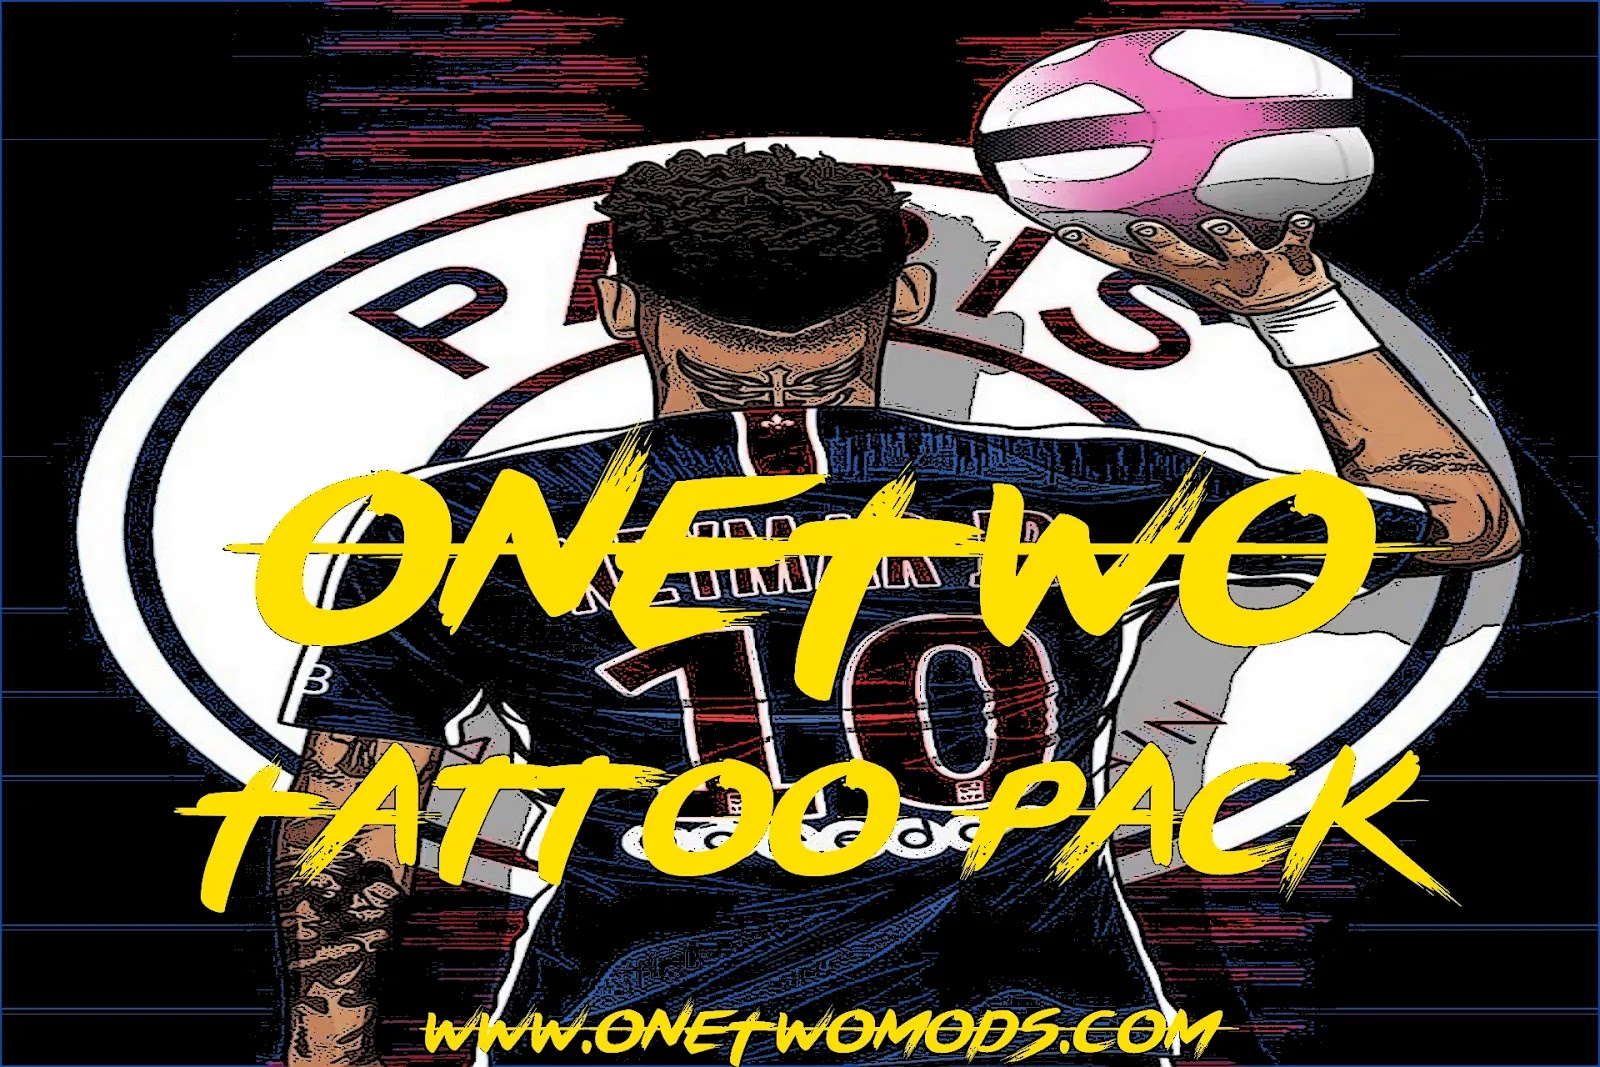 الاصدار الشامل من باك تاتو وان توو الجديد - ONE TWO Tattoo Pack 900 AIO